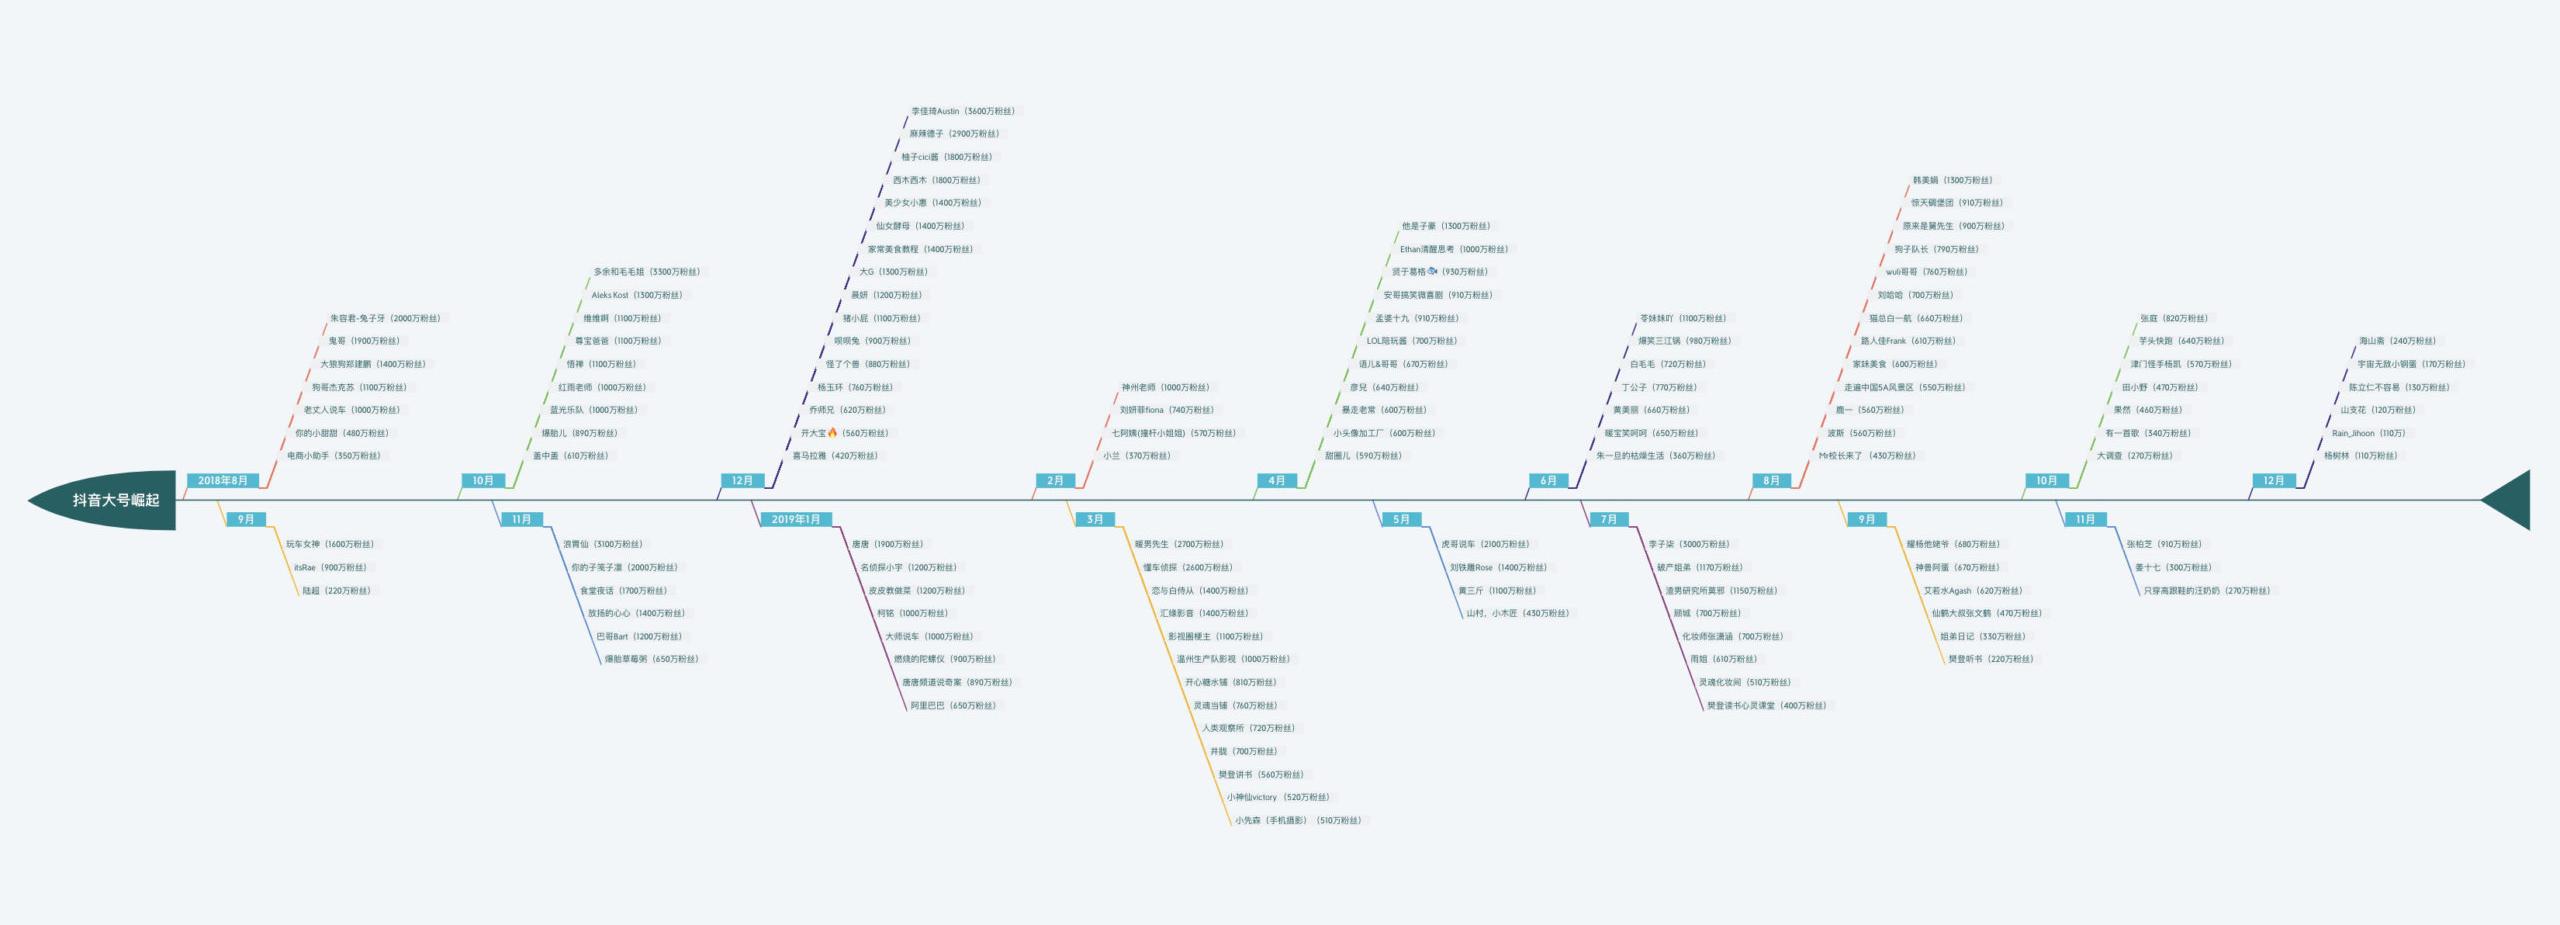 <a href='http://mcnjigou.com/?tags=3'>抖音</a>上热门的机制变化过程:内容输出的标准不会一成不变!